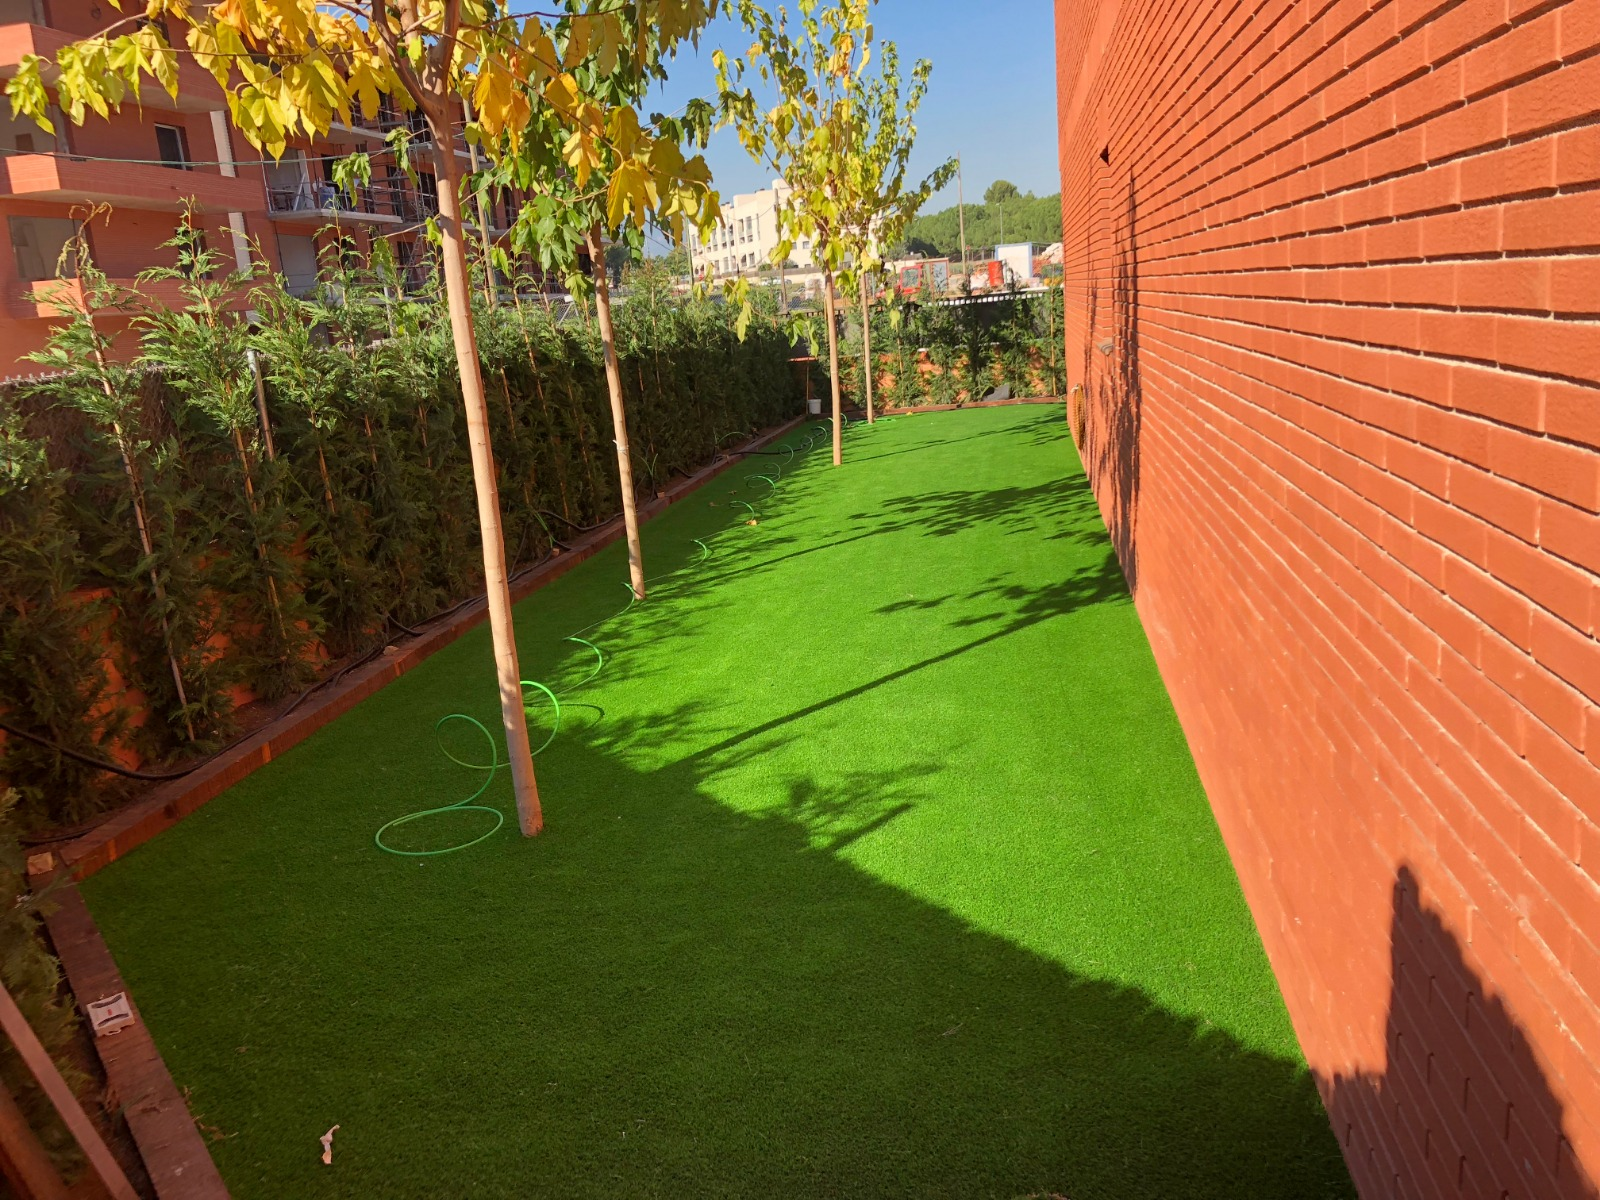 césped artificial de calidad Barcelona